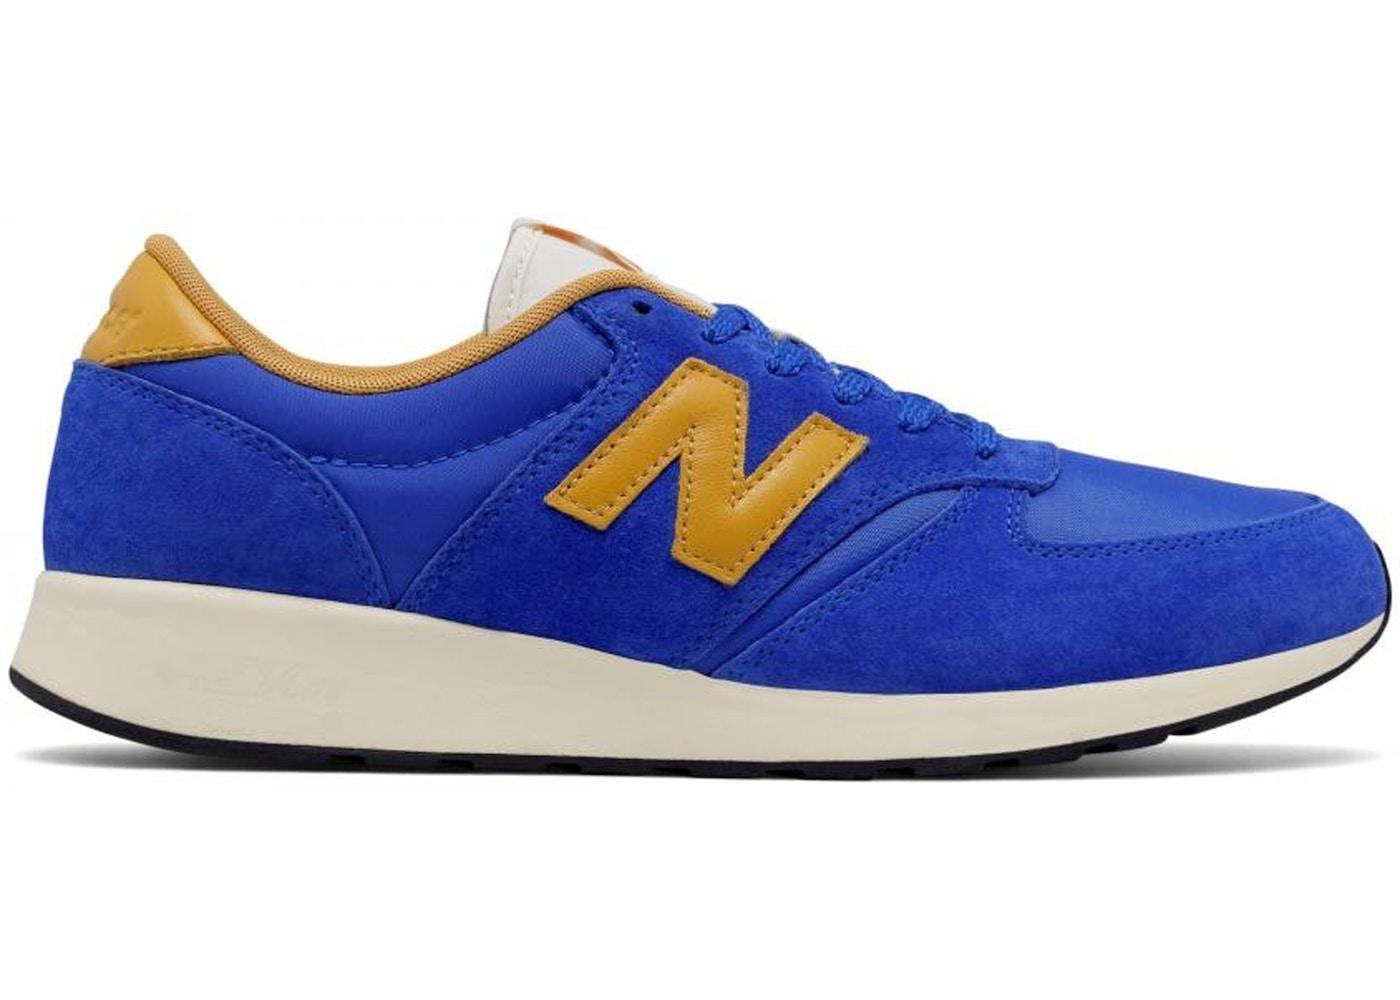 New Balance 420 Blue Tan - MRL420SV